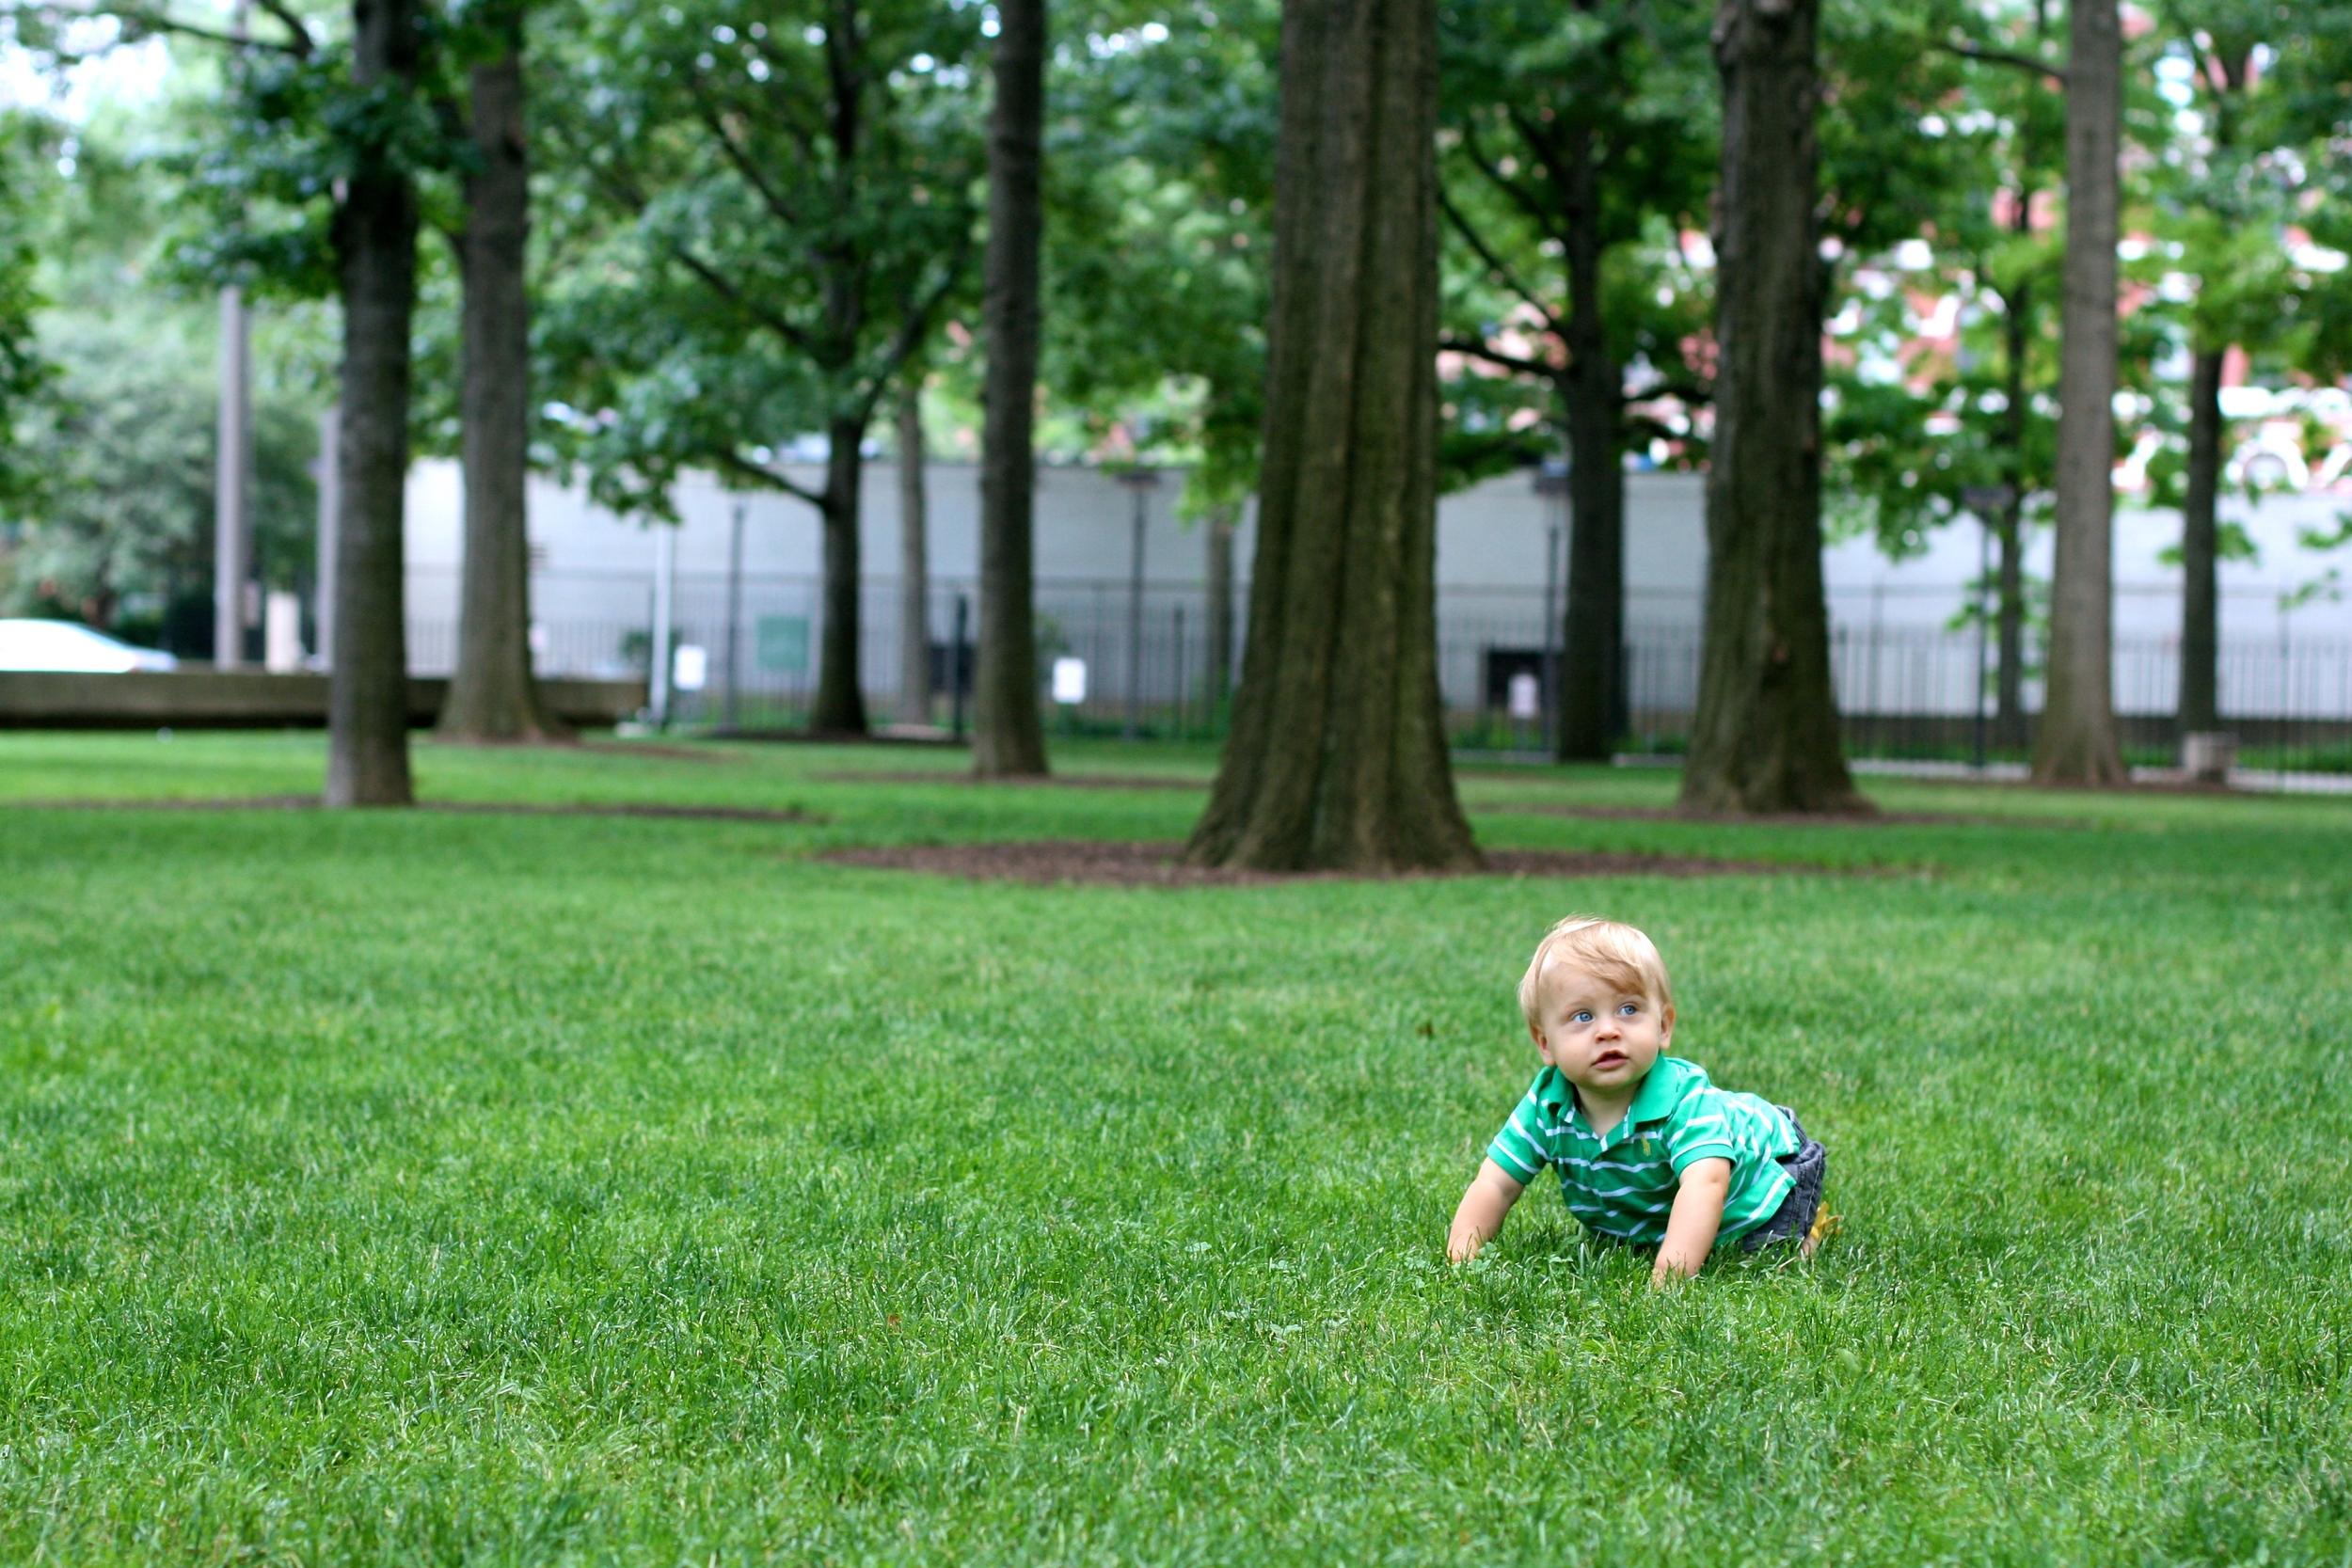 Those wild grasses of New York City.